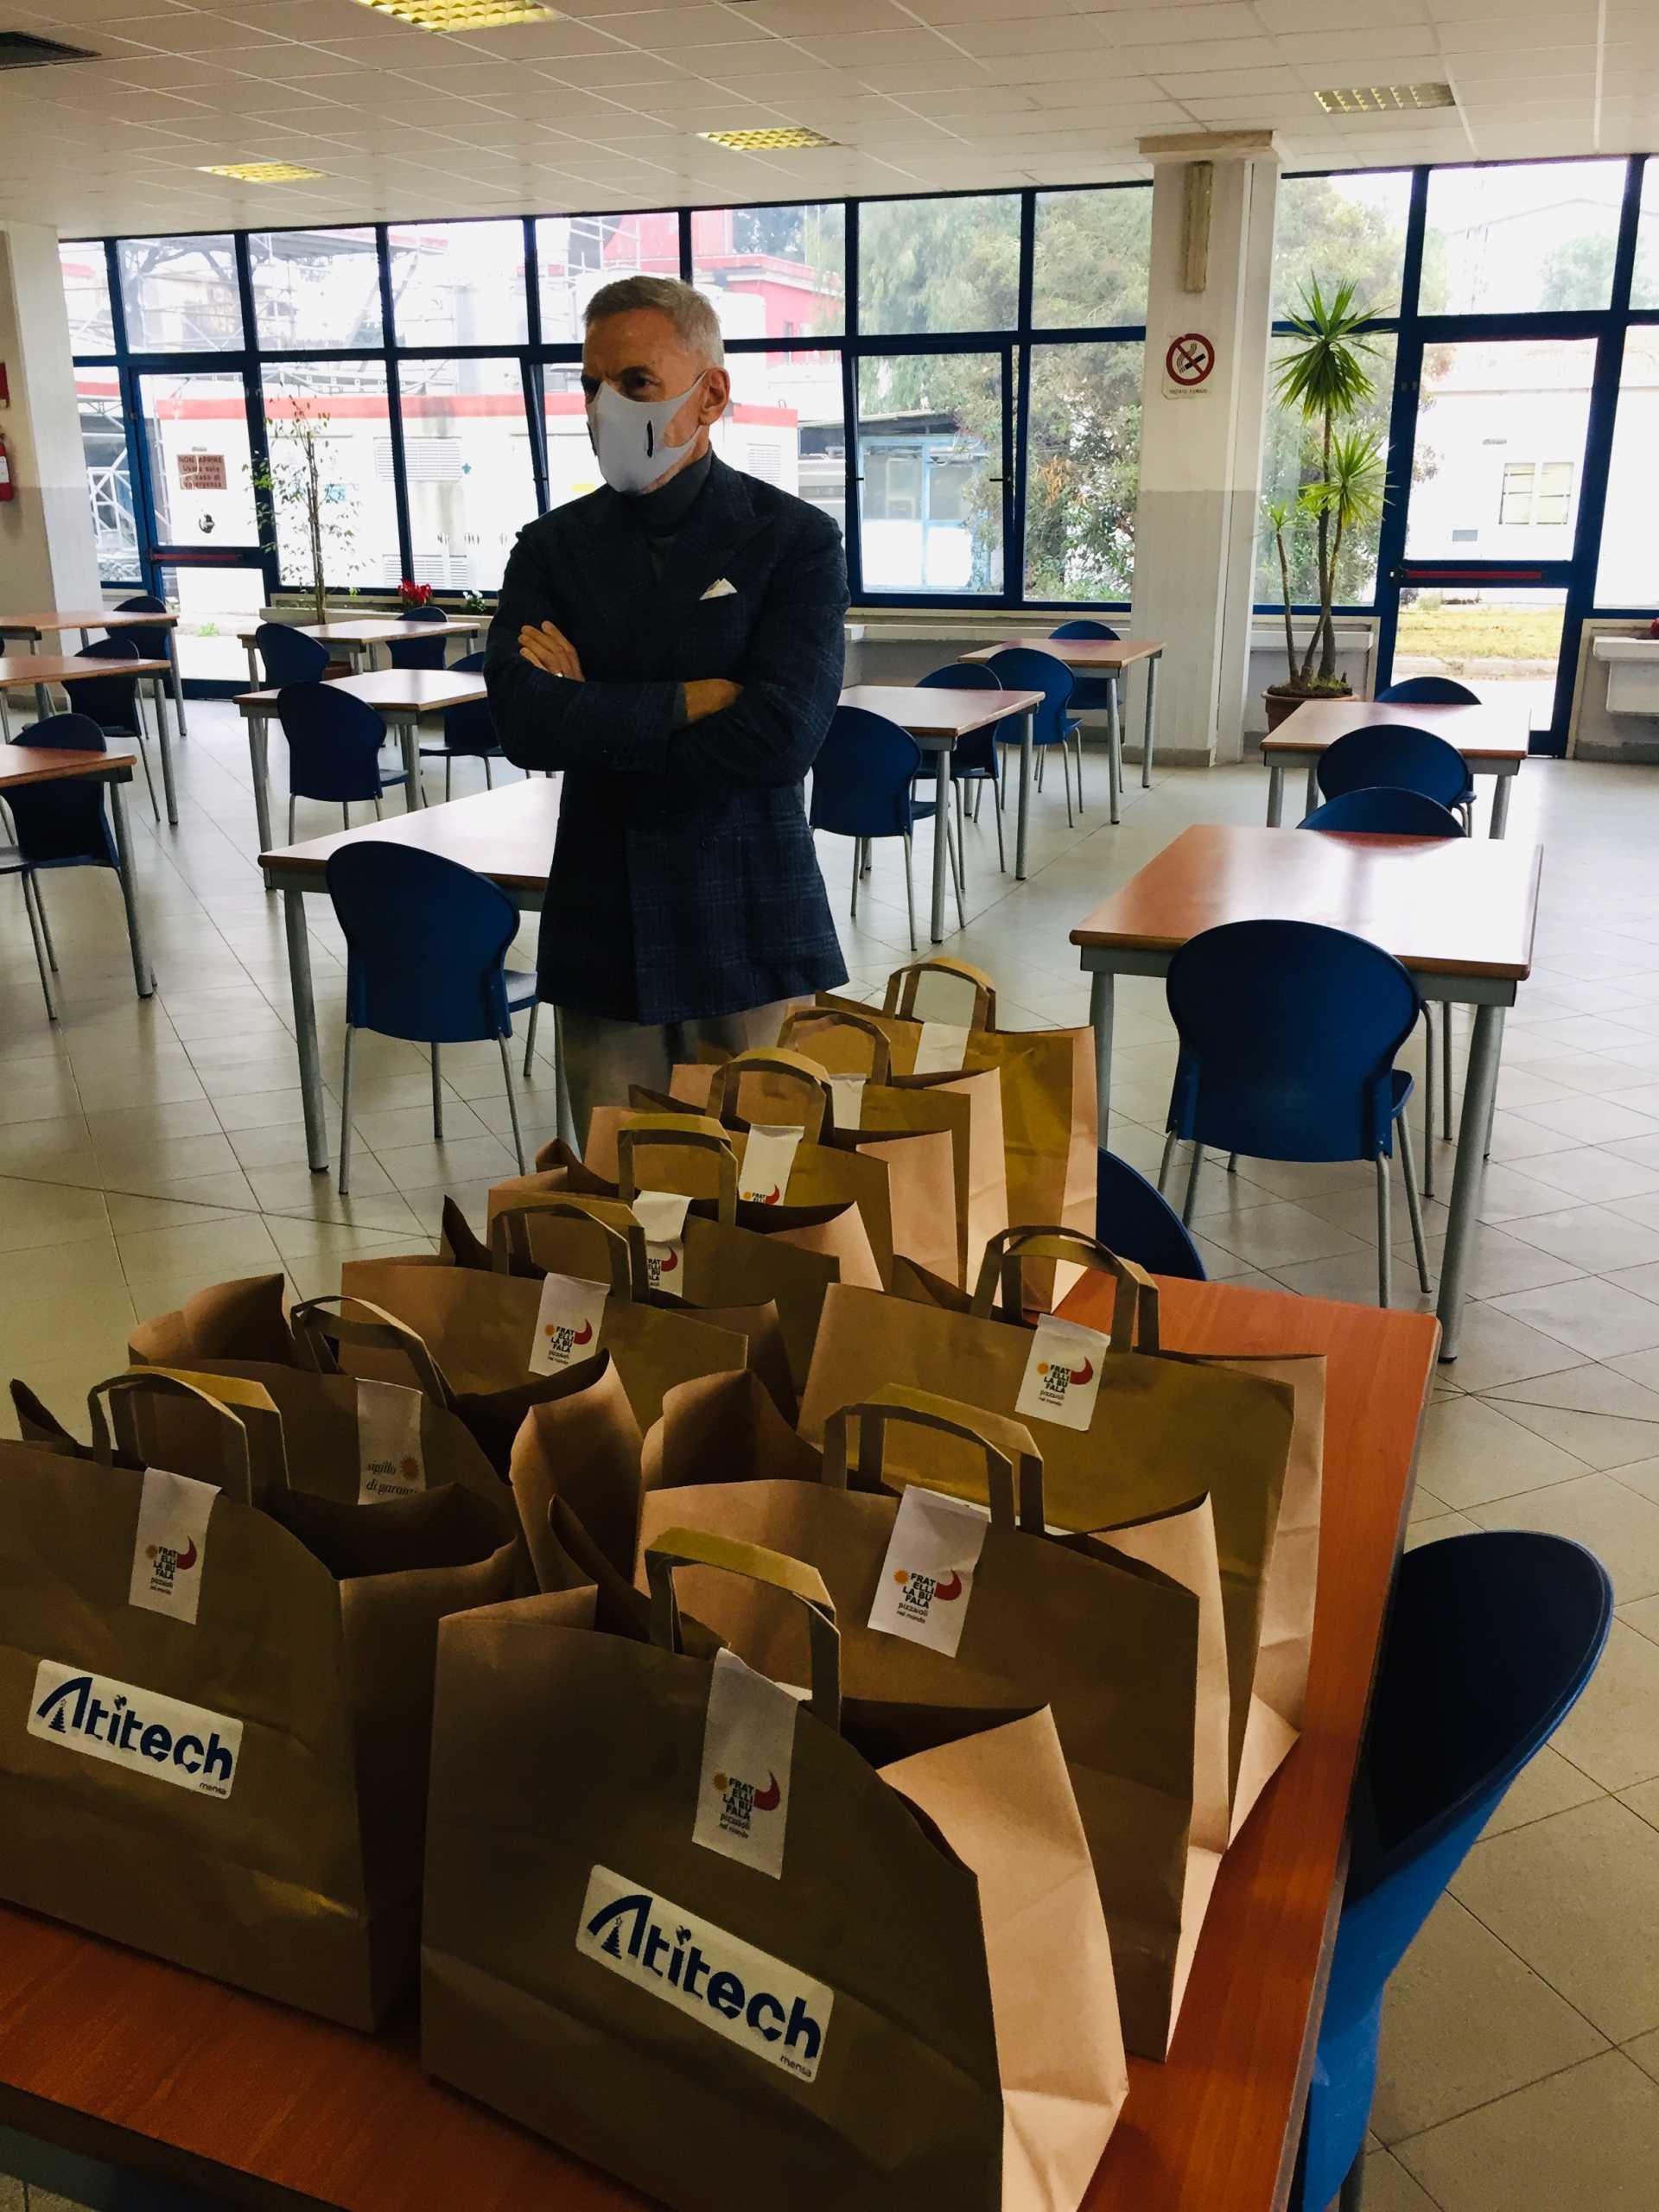 Atitech per il sociale, 1500 pasti nei quartieri disagiati